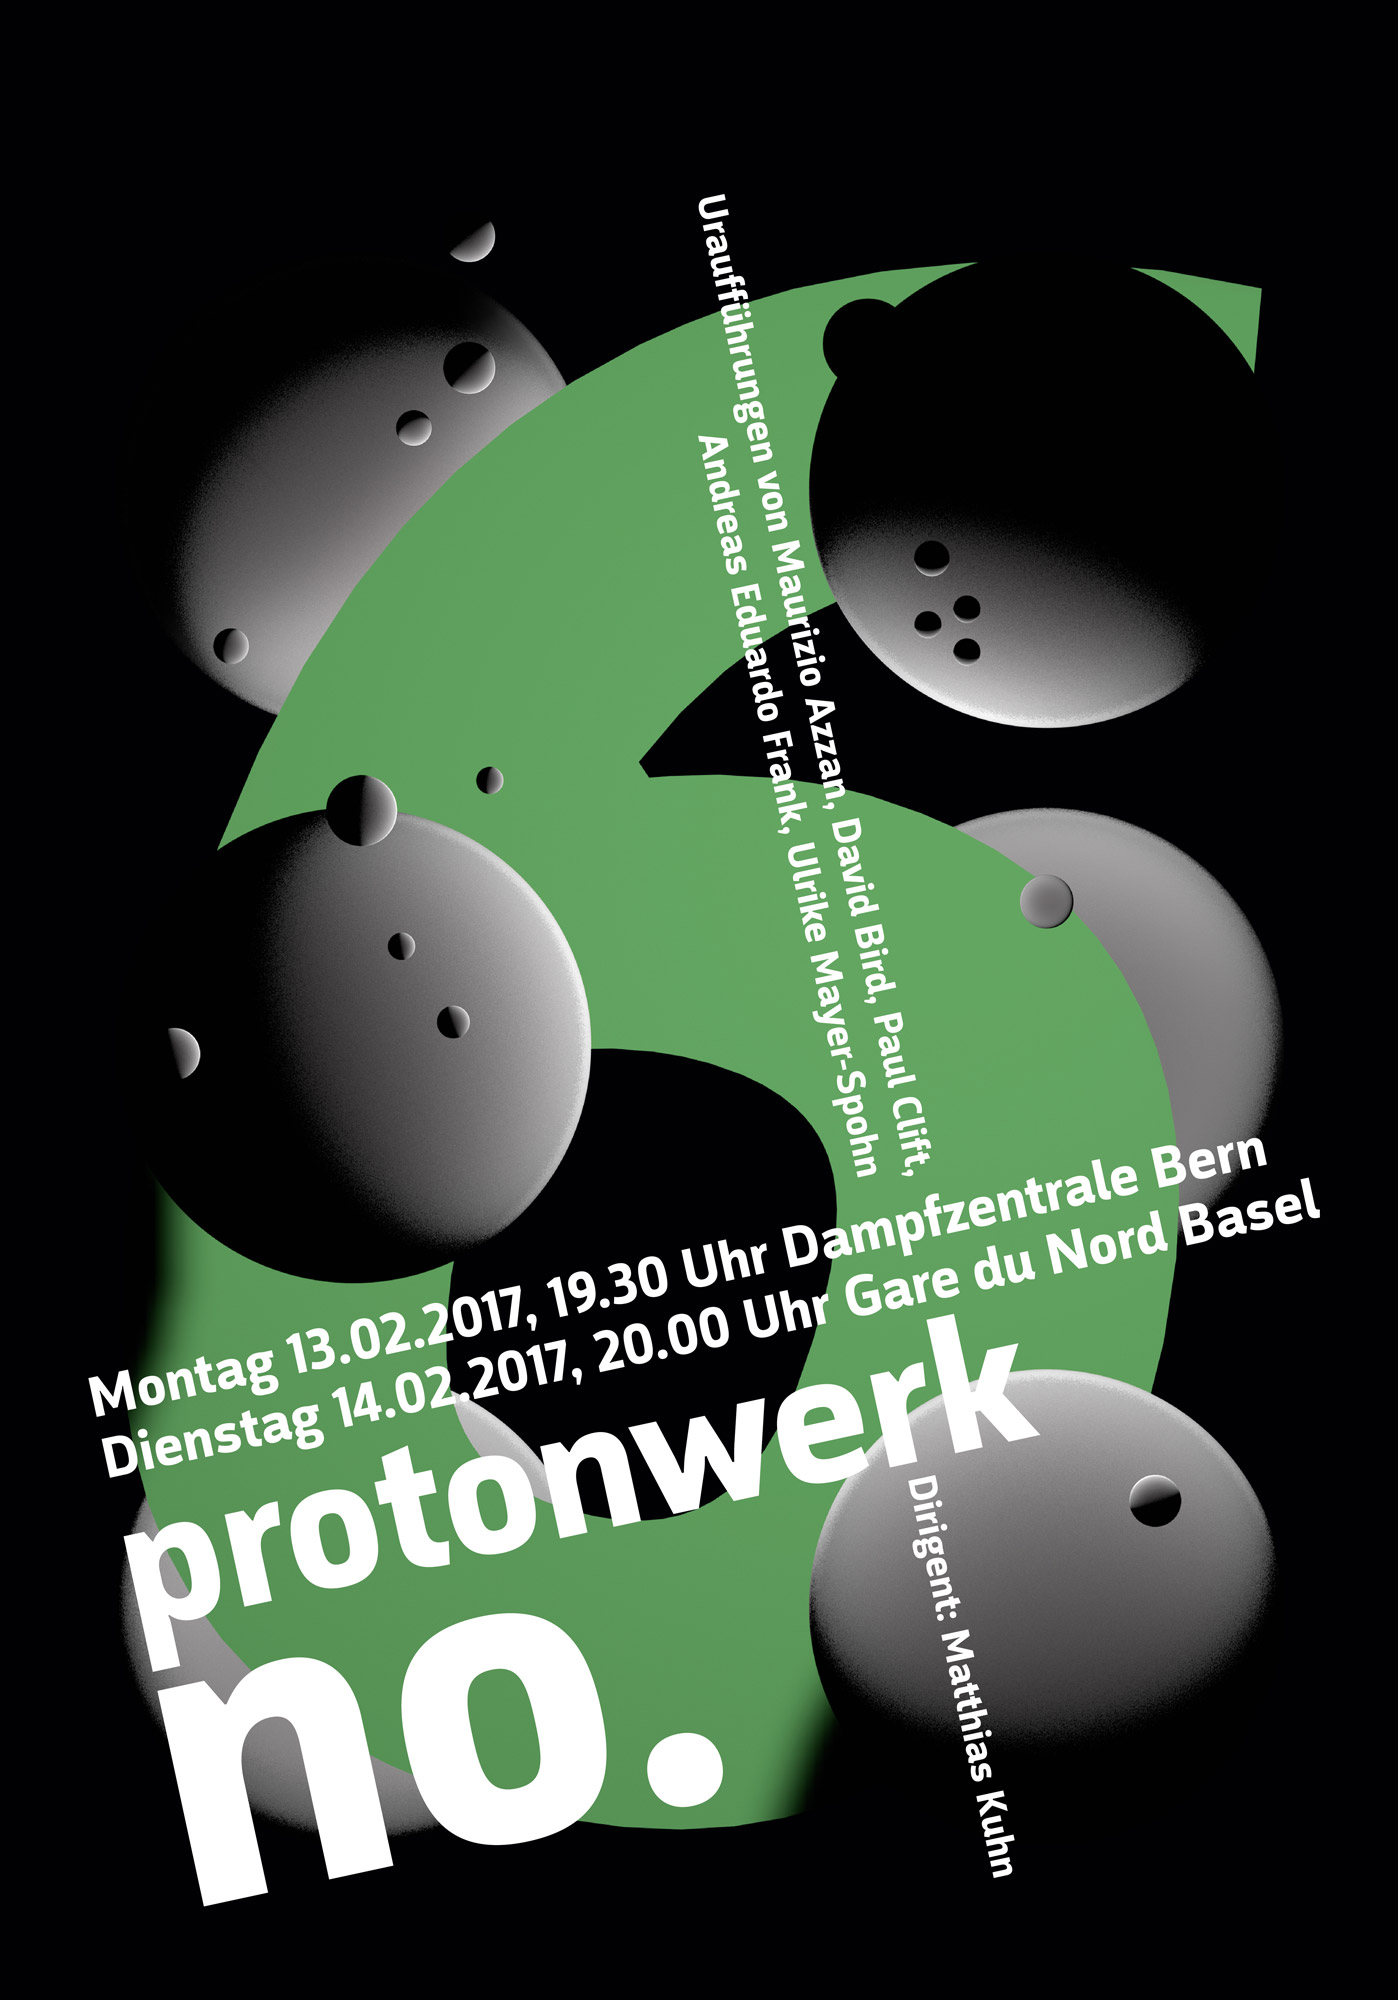 protonwerk no. 6